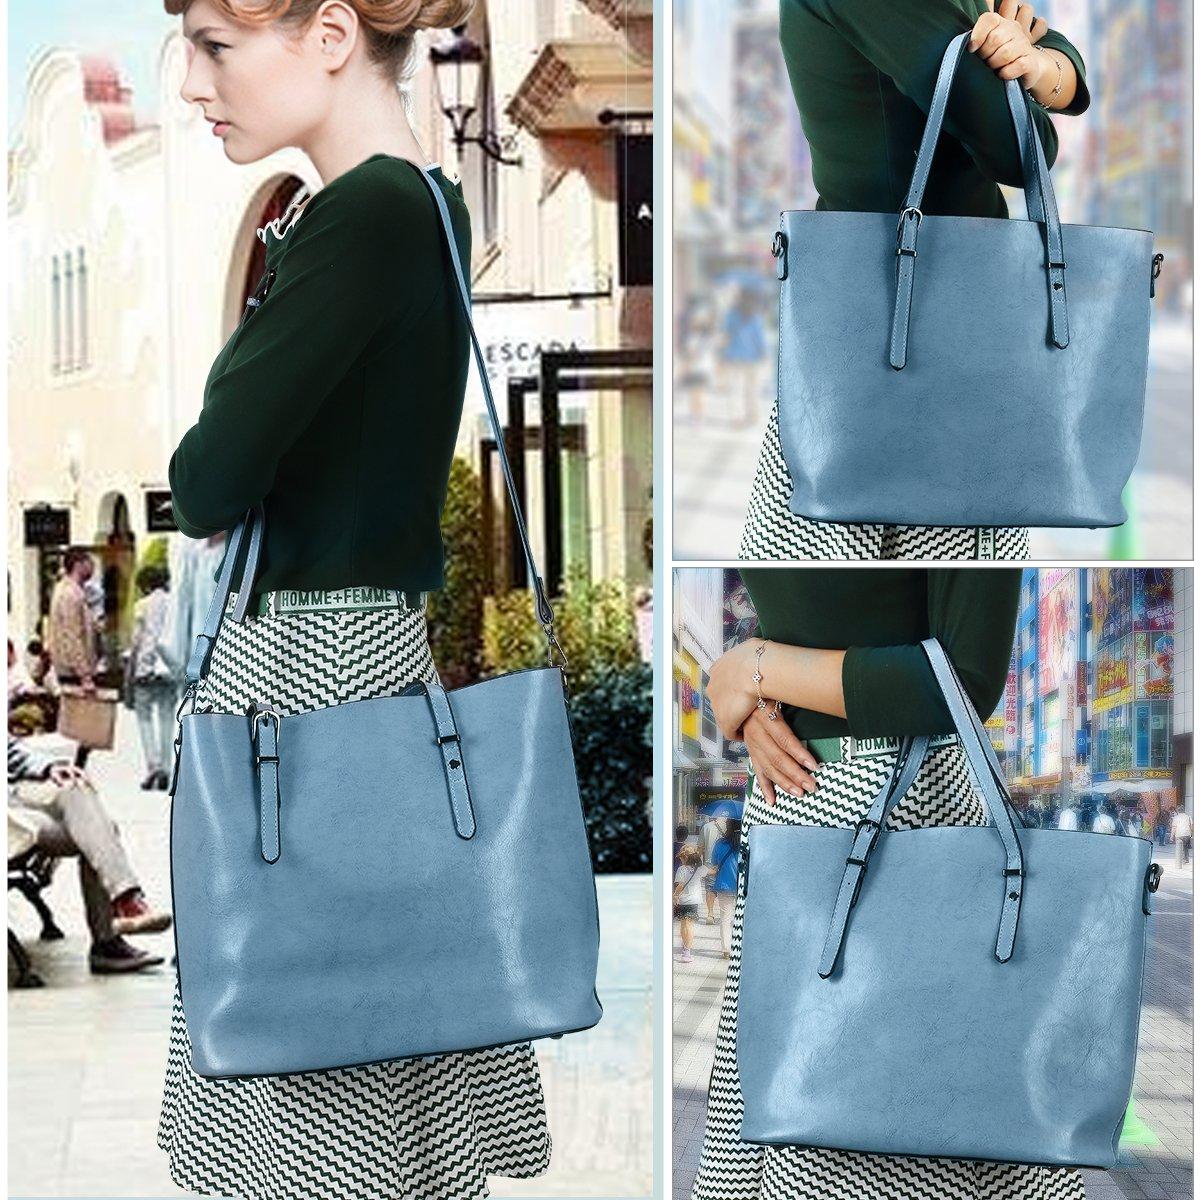 Women Top Handle Satchel Handbags Shoulder Bag Messenger Tote Bag Purse IUKIO (Light Blue) by IUKIO (Image #3)